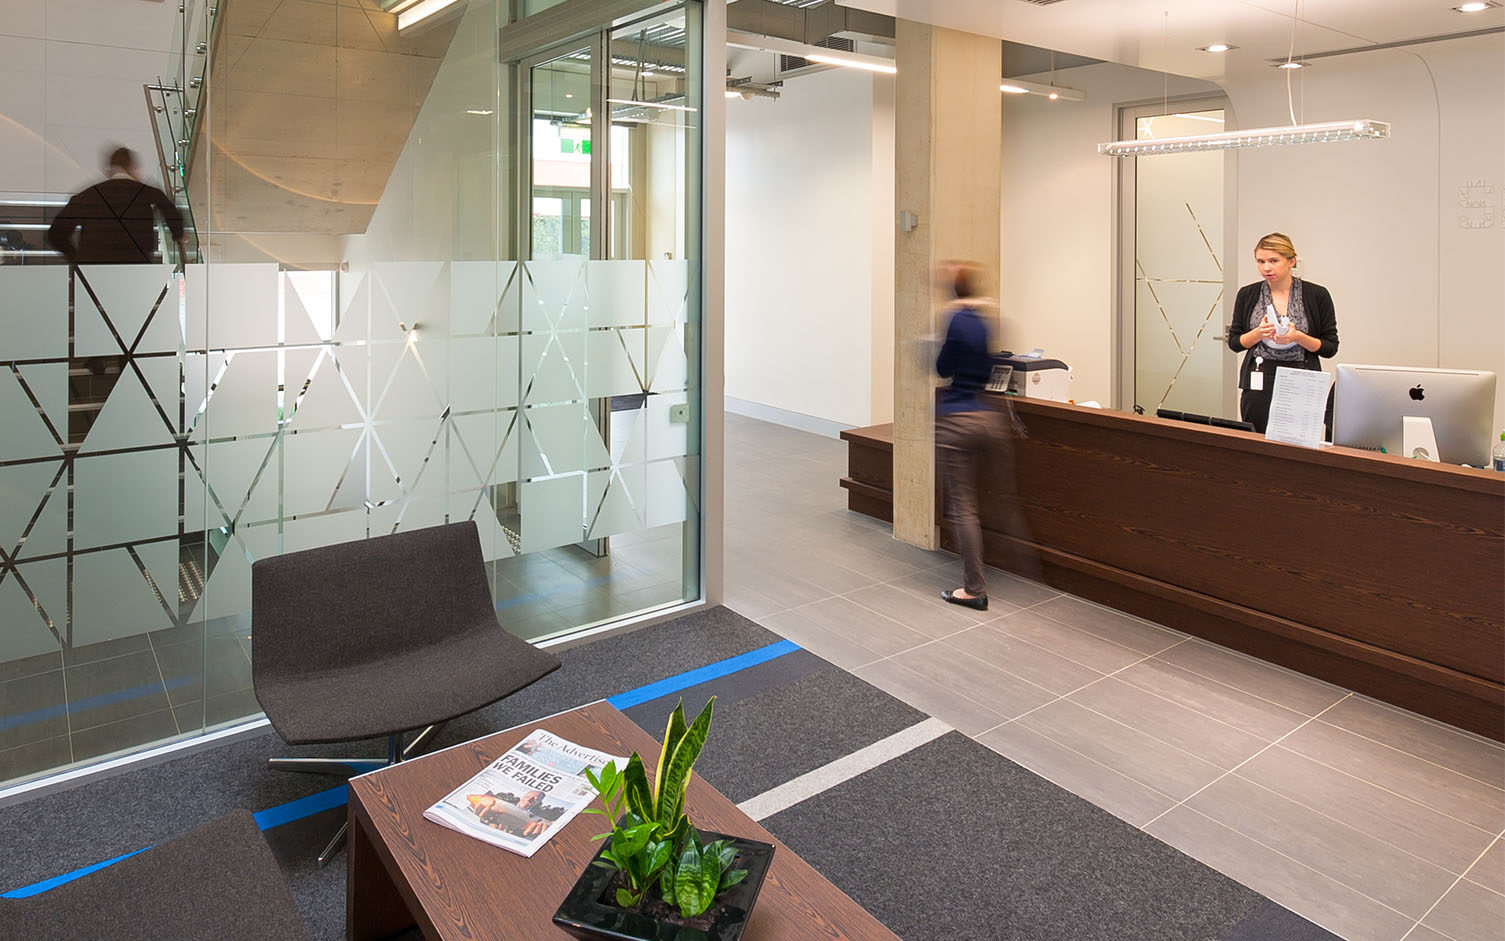 https://ggtiling.com.au/wp-content/uploads/2016/06/Sarah-Constructions-Head-Quarters-G-G-Tiling_0004_Sarah-Constructins-Head-Office-2.jpg